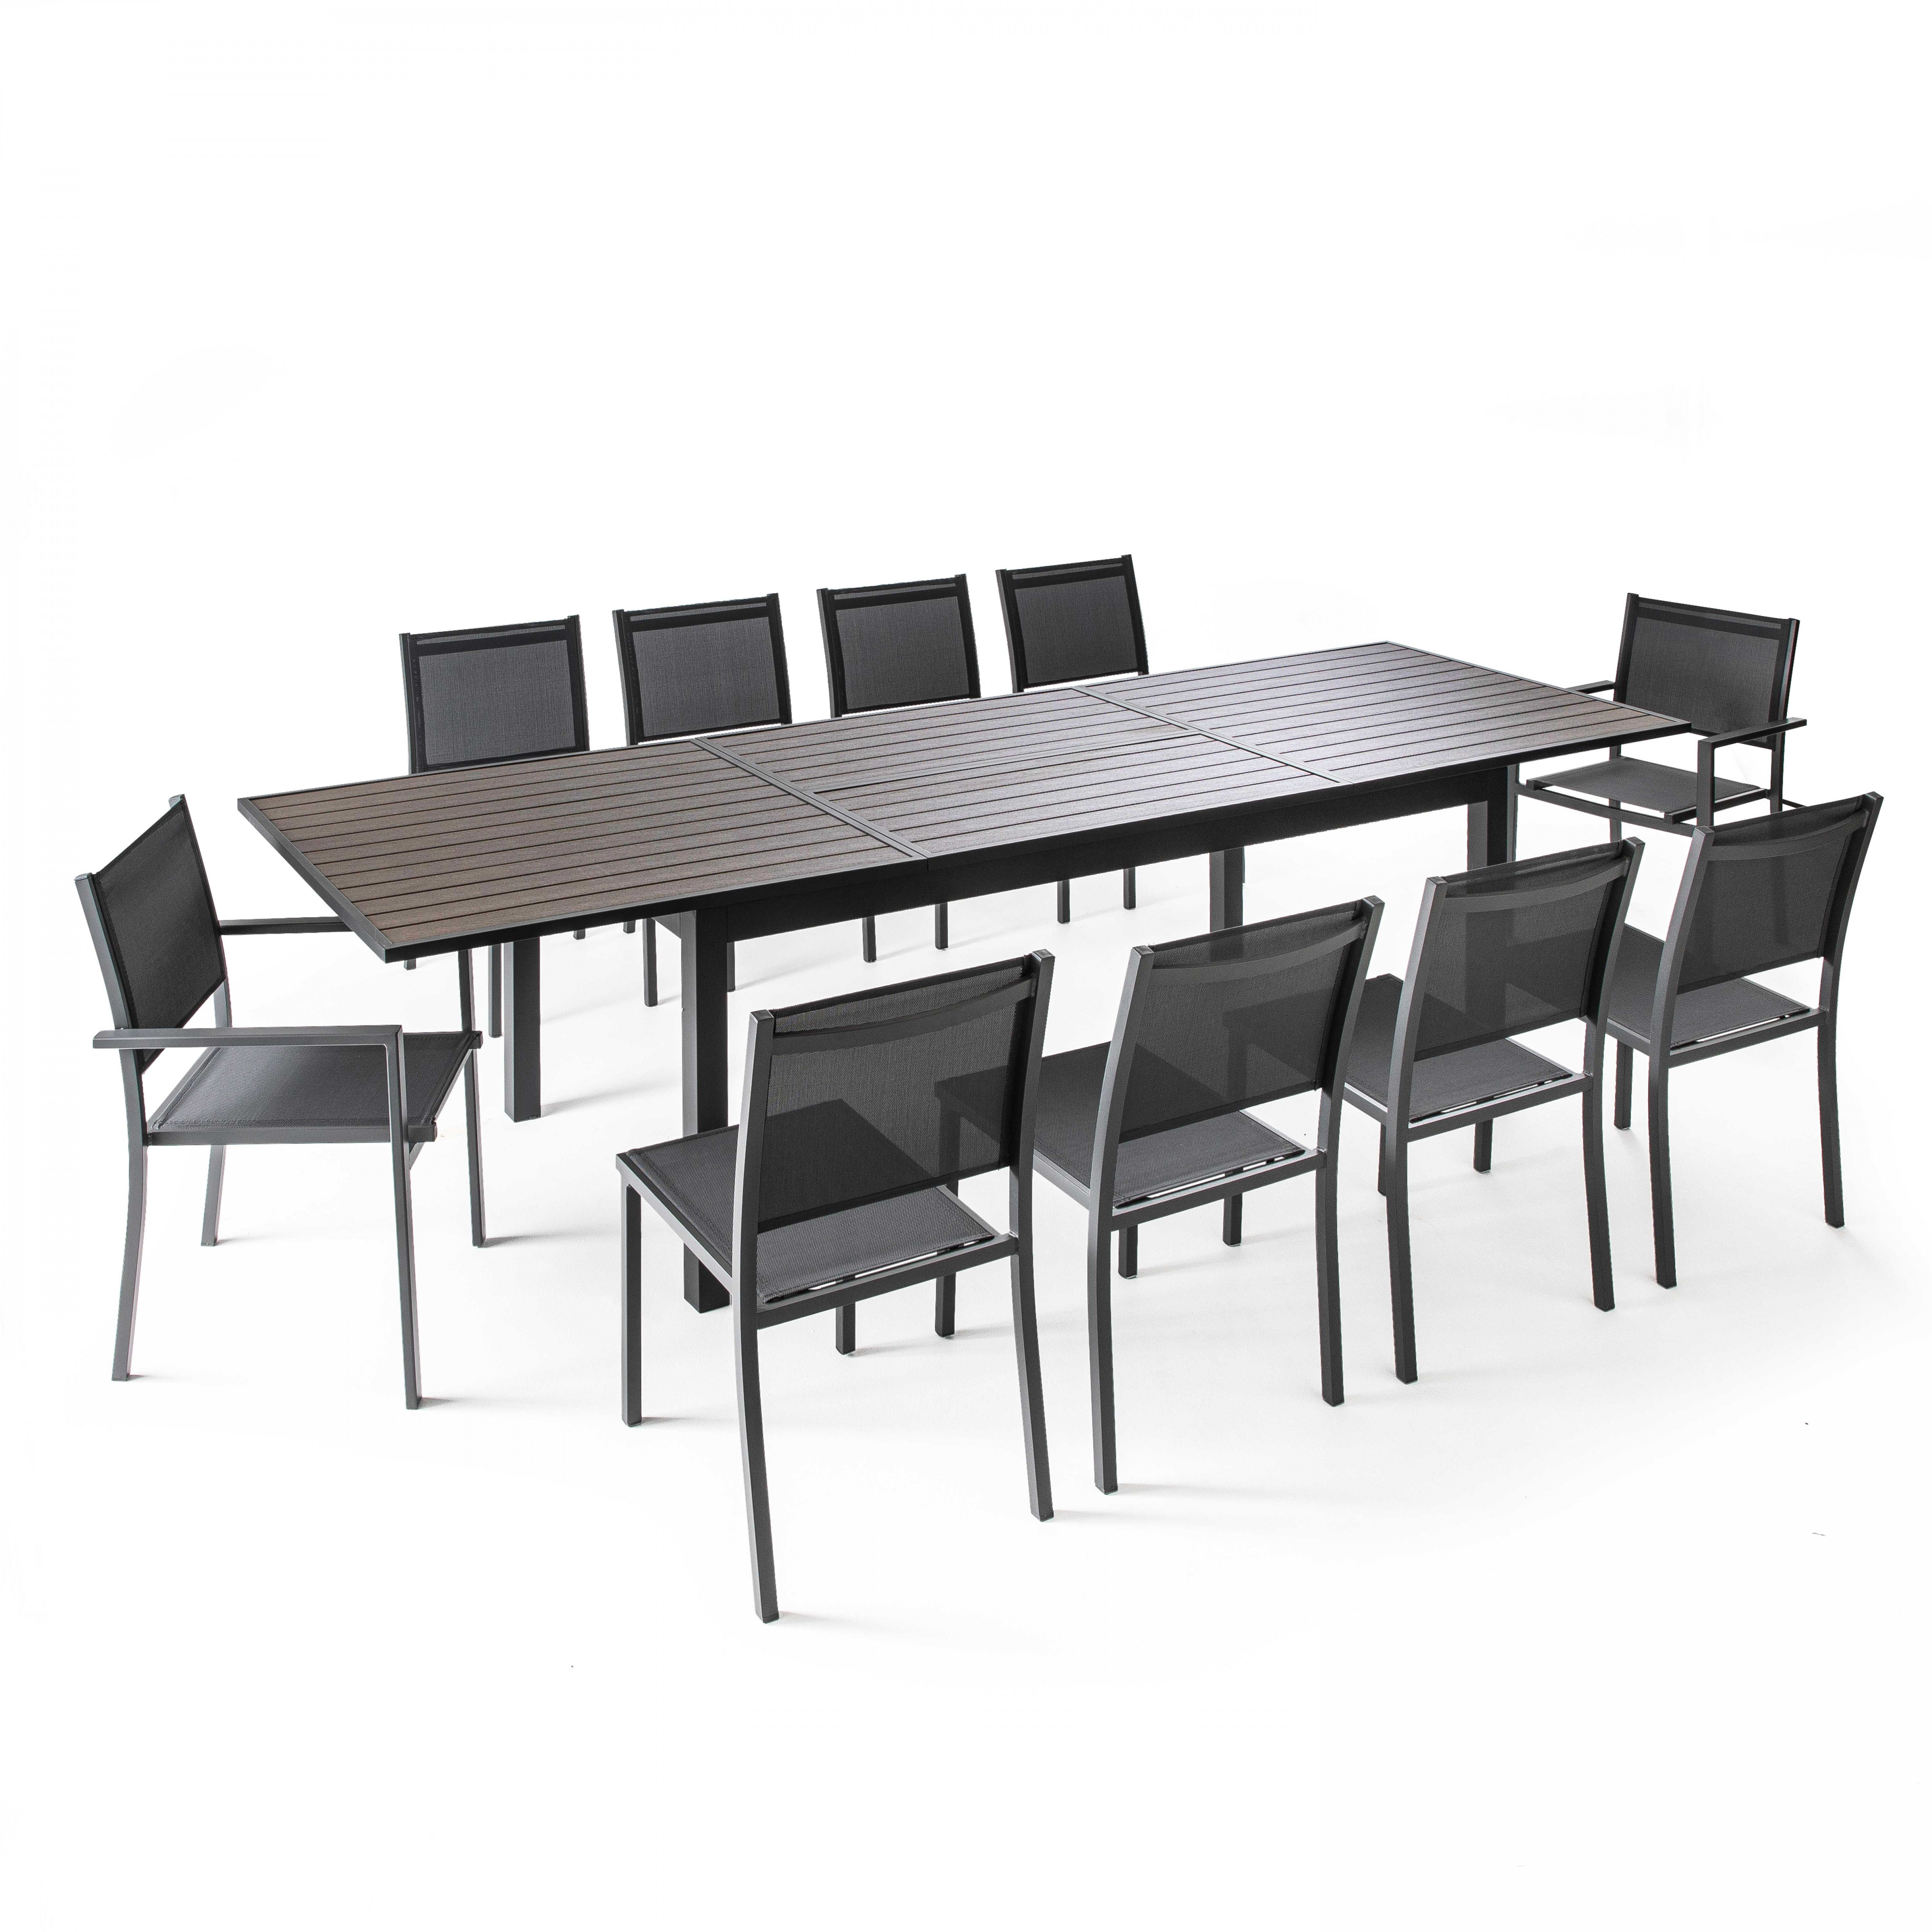 Table de jardin extensible 10 places aluminium et polywood, Nice